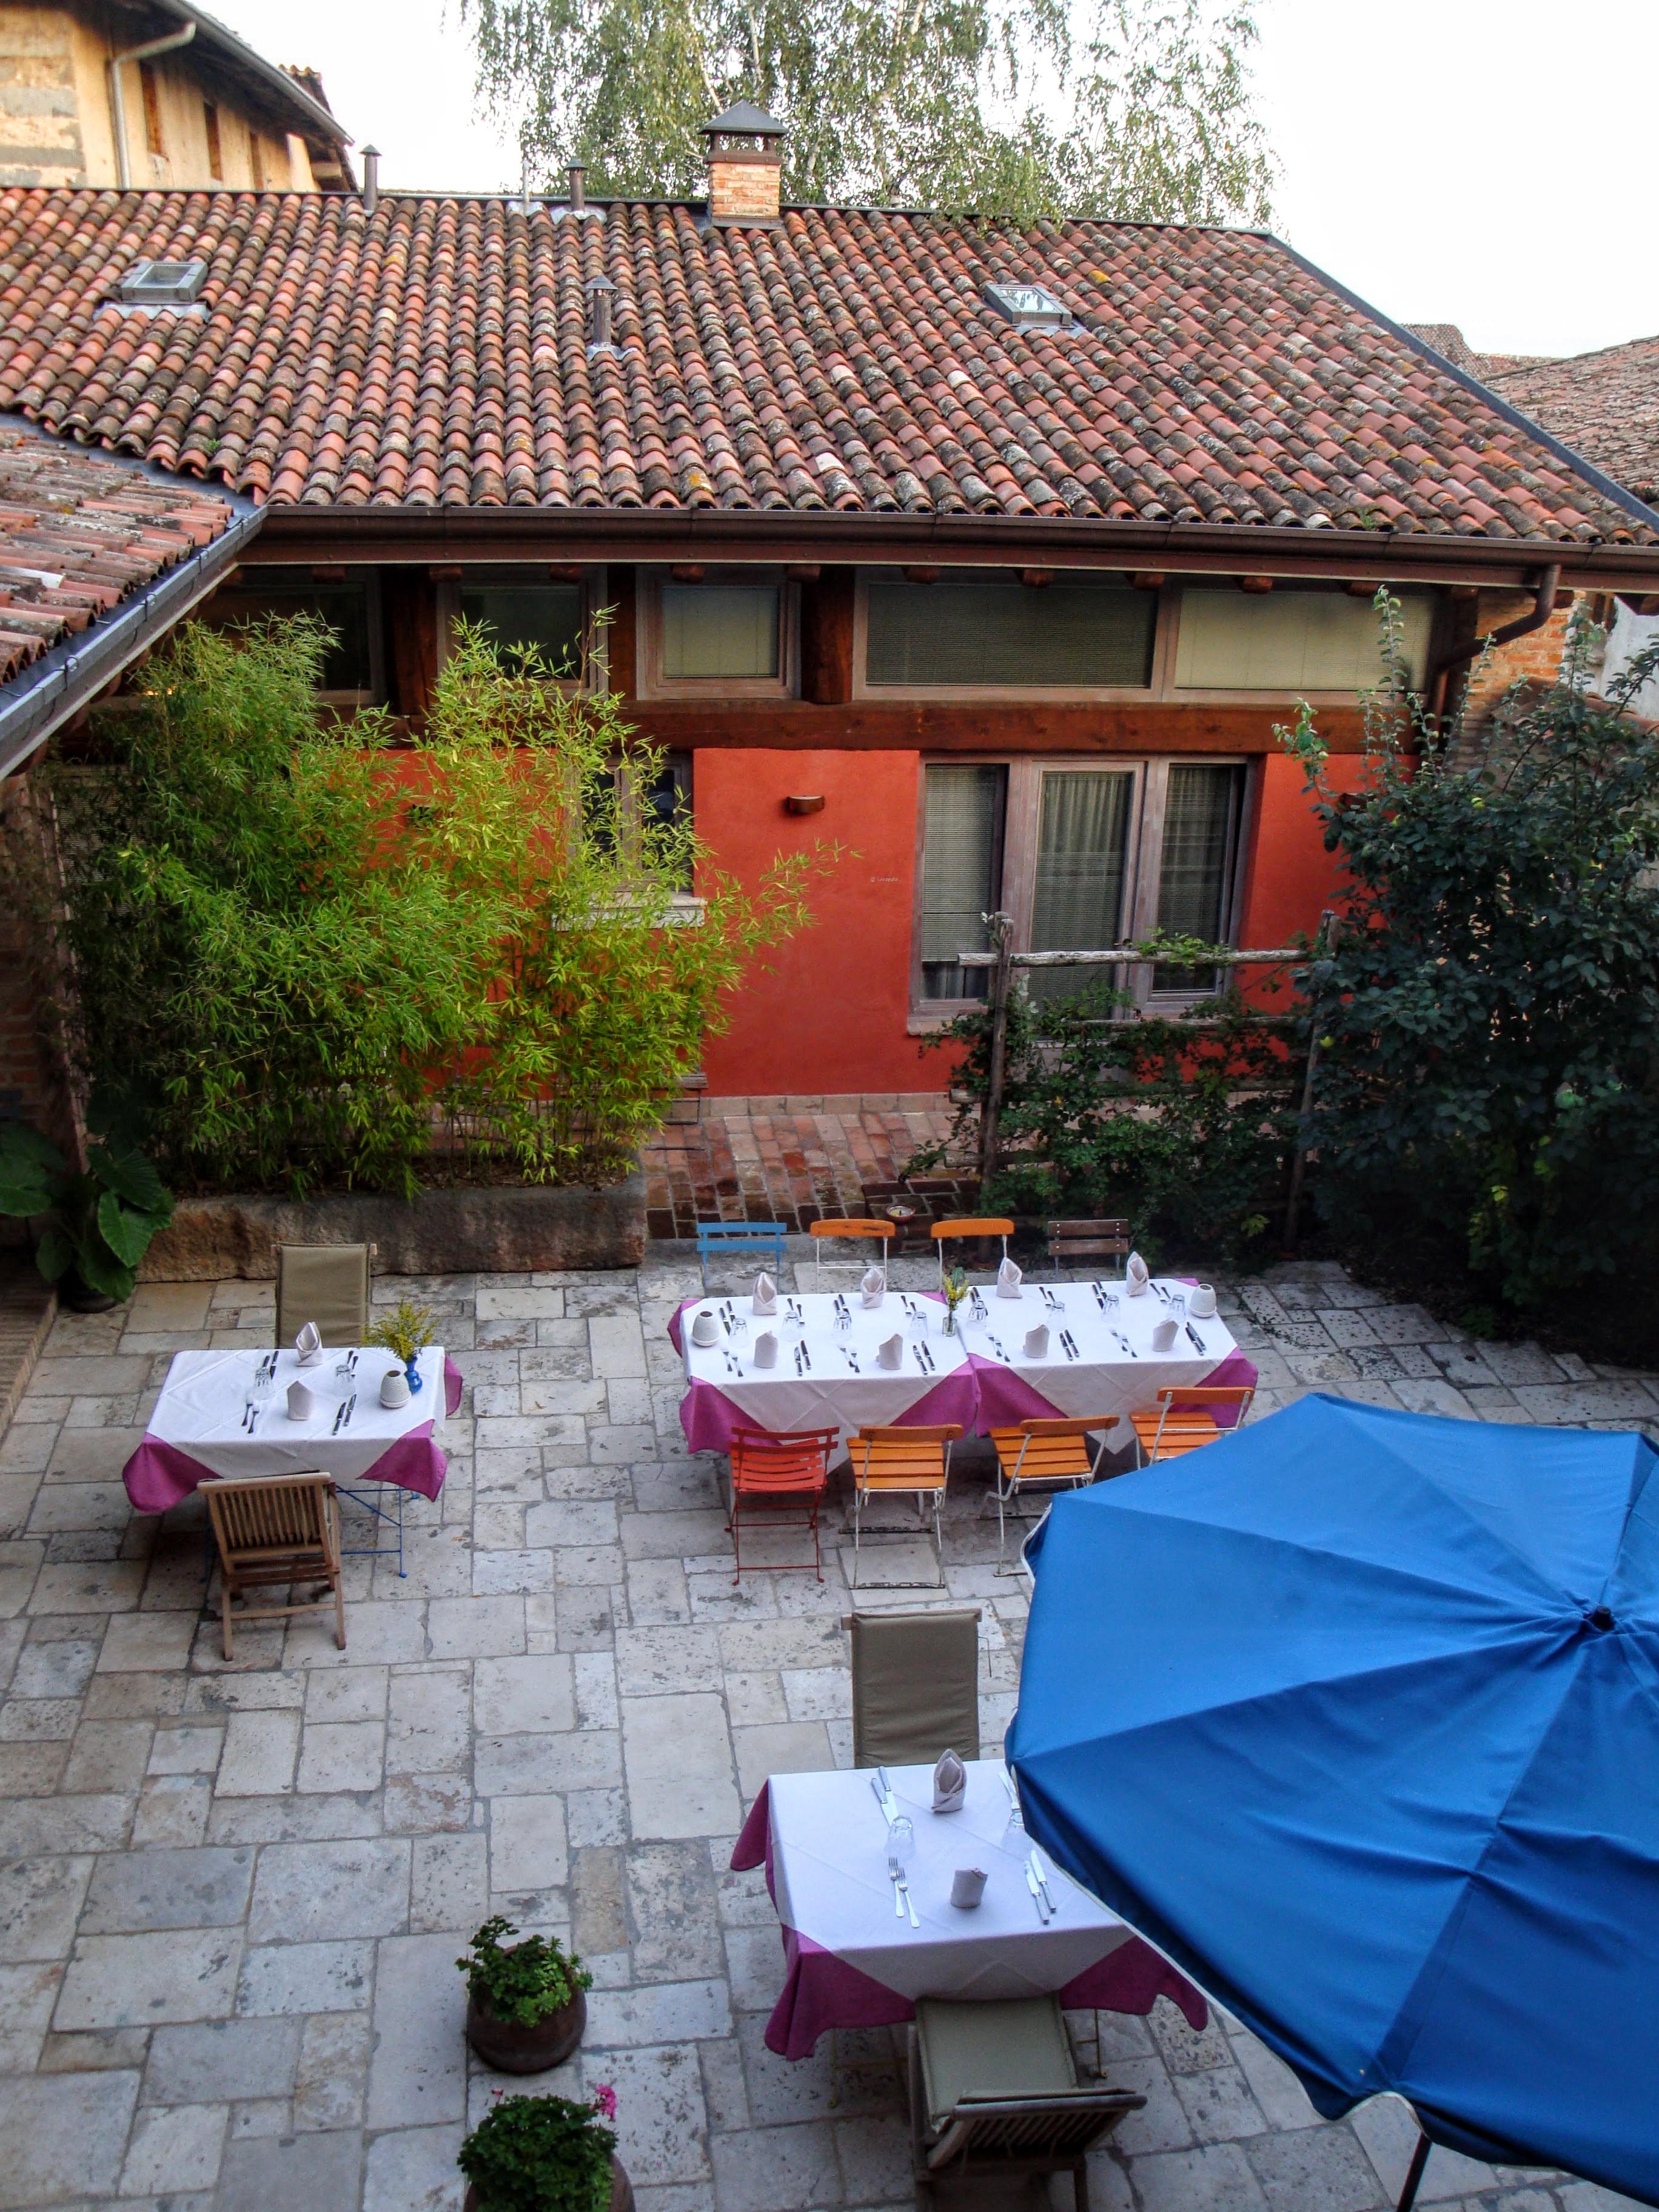 Boutique Hotel Villa Dei Campi Hotelovely